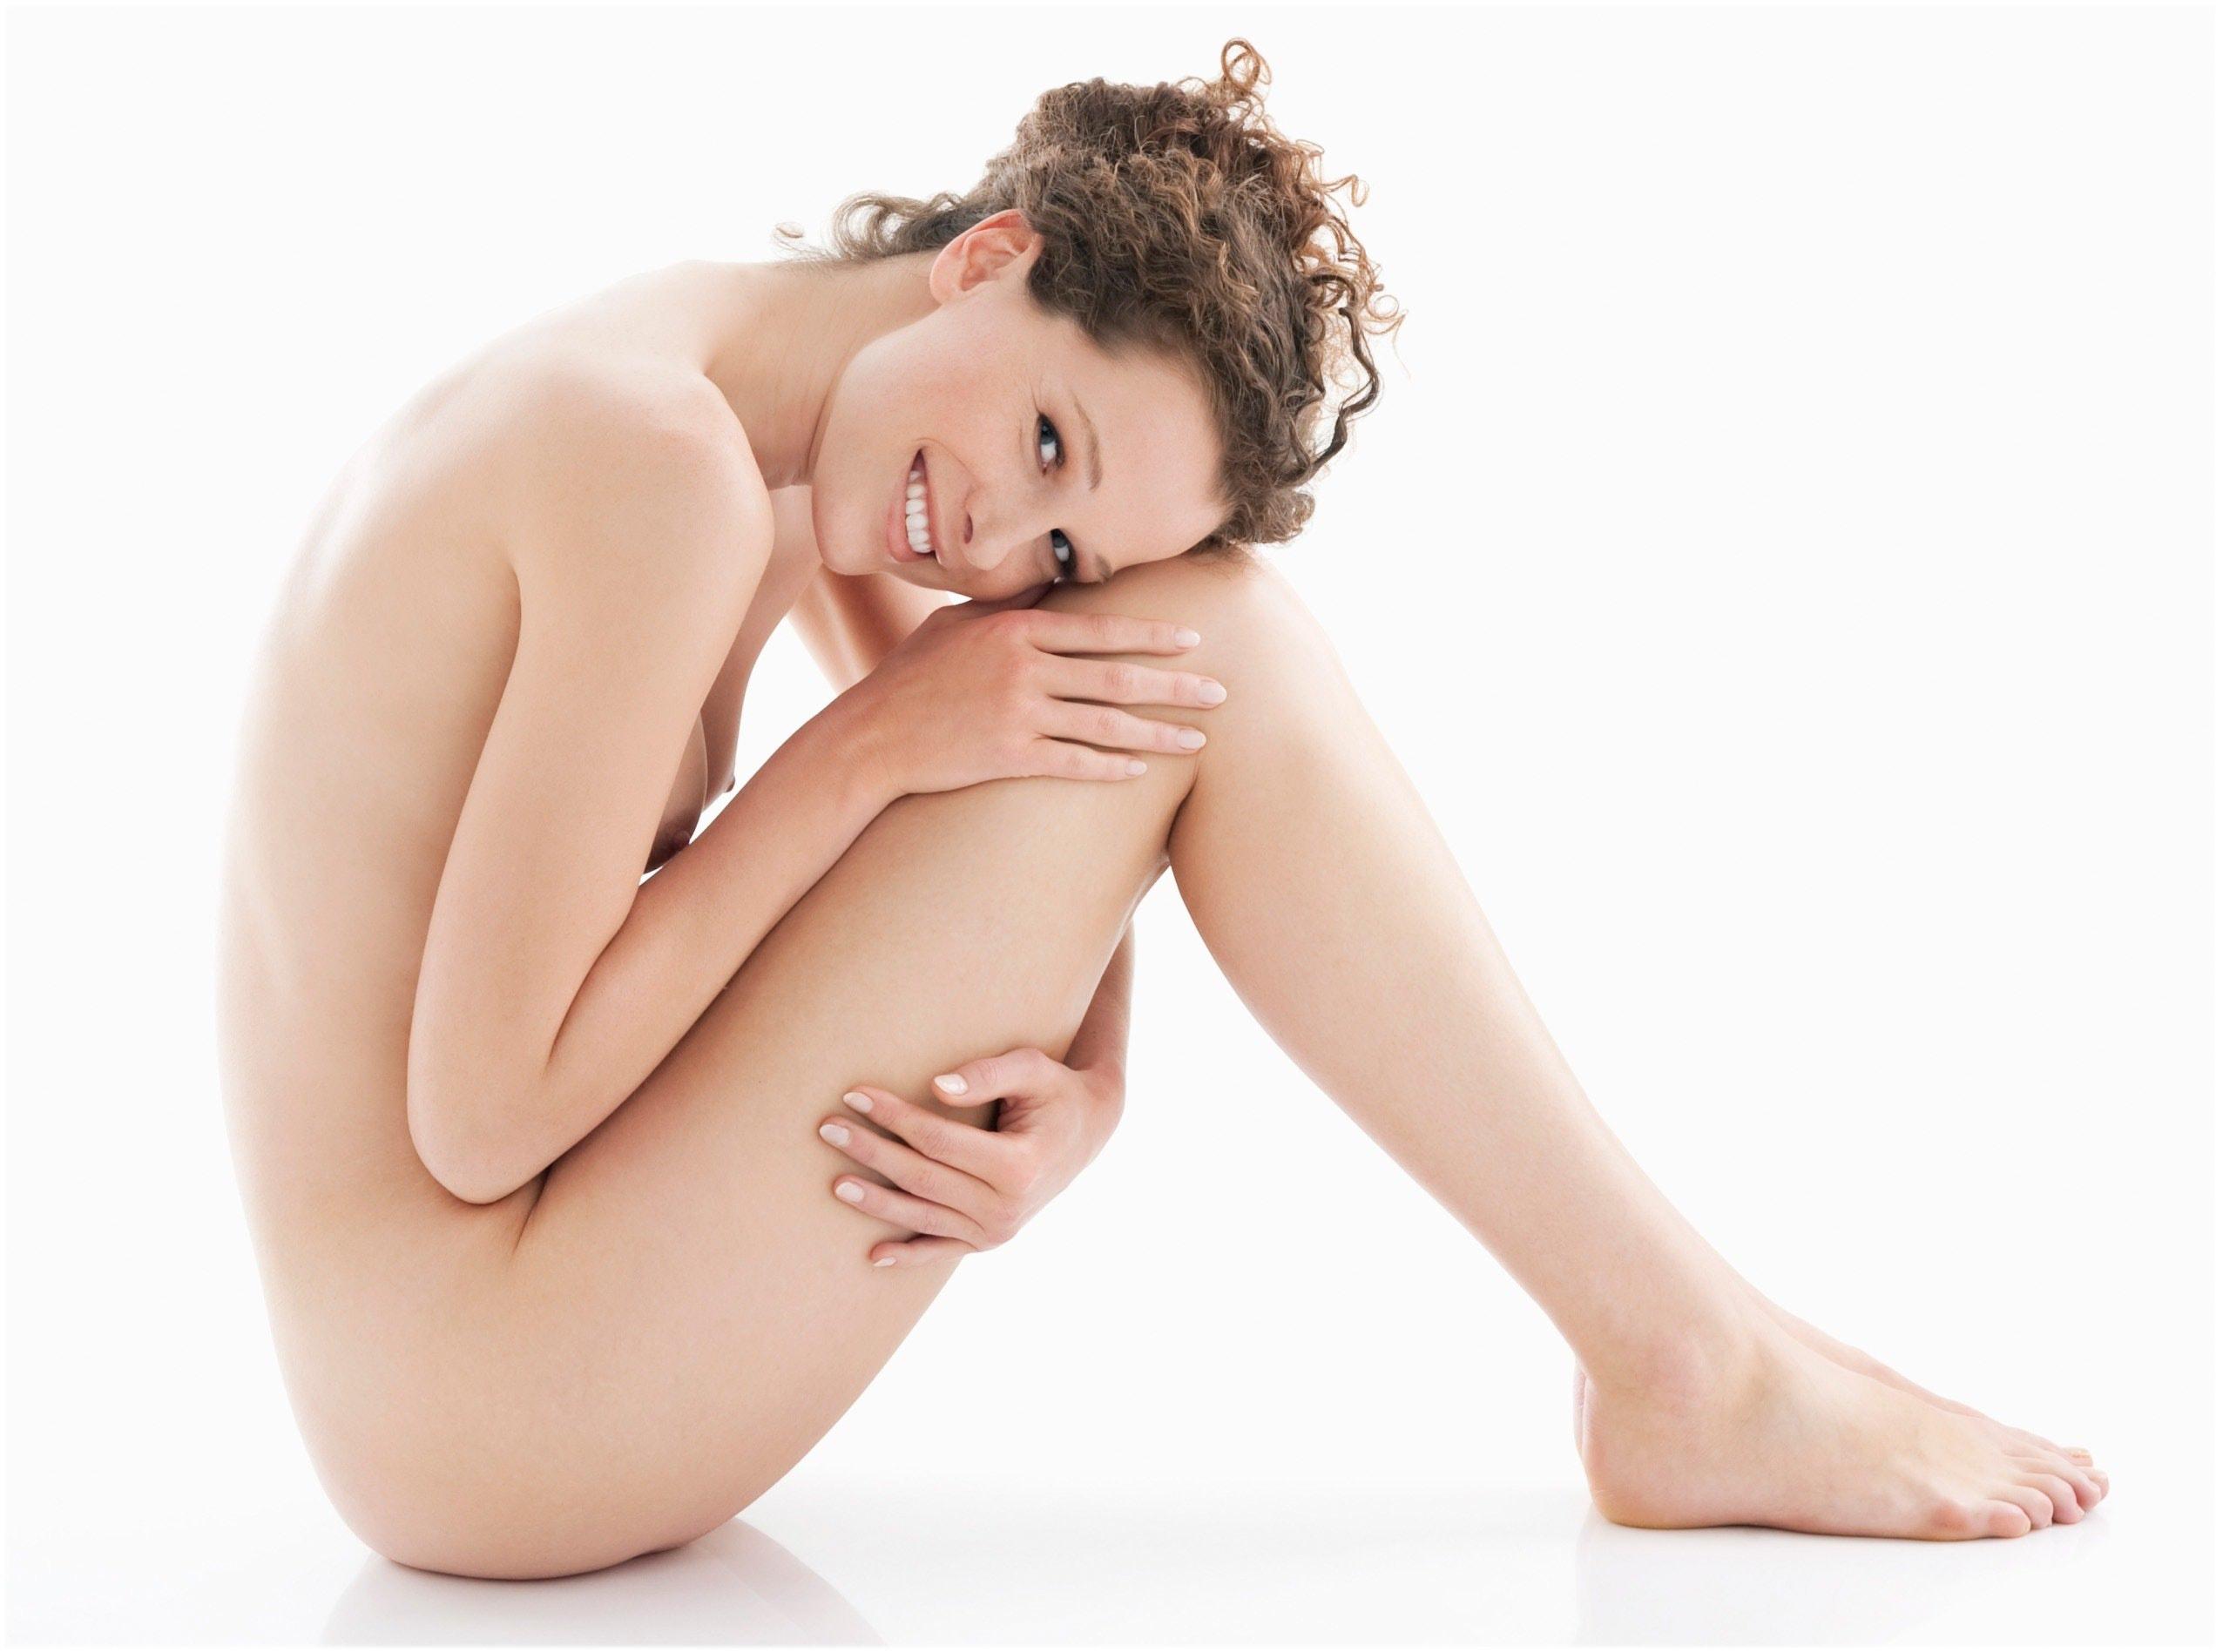 massageklinik vejle fransk sex